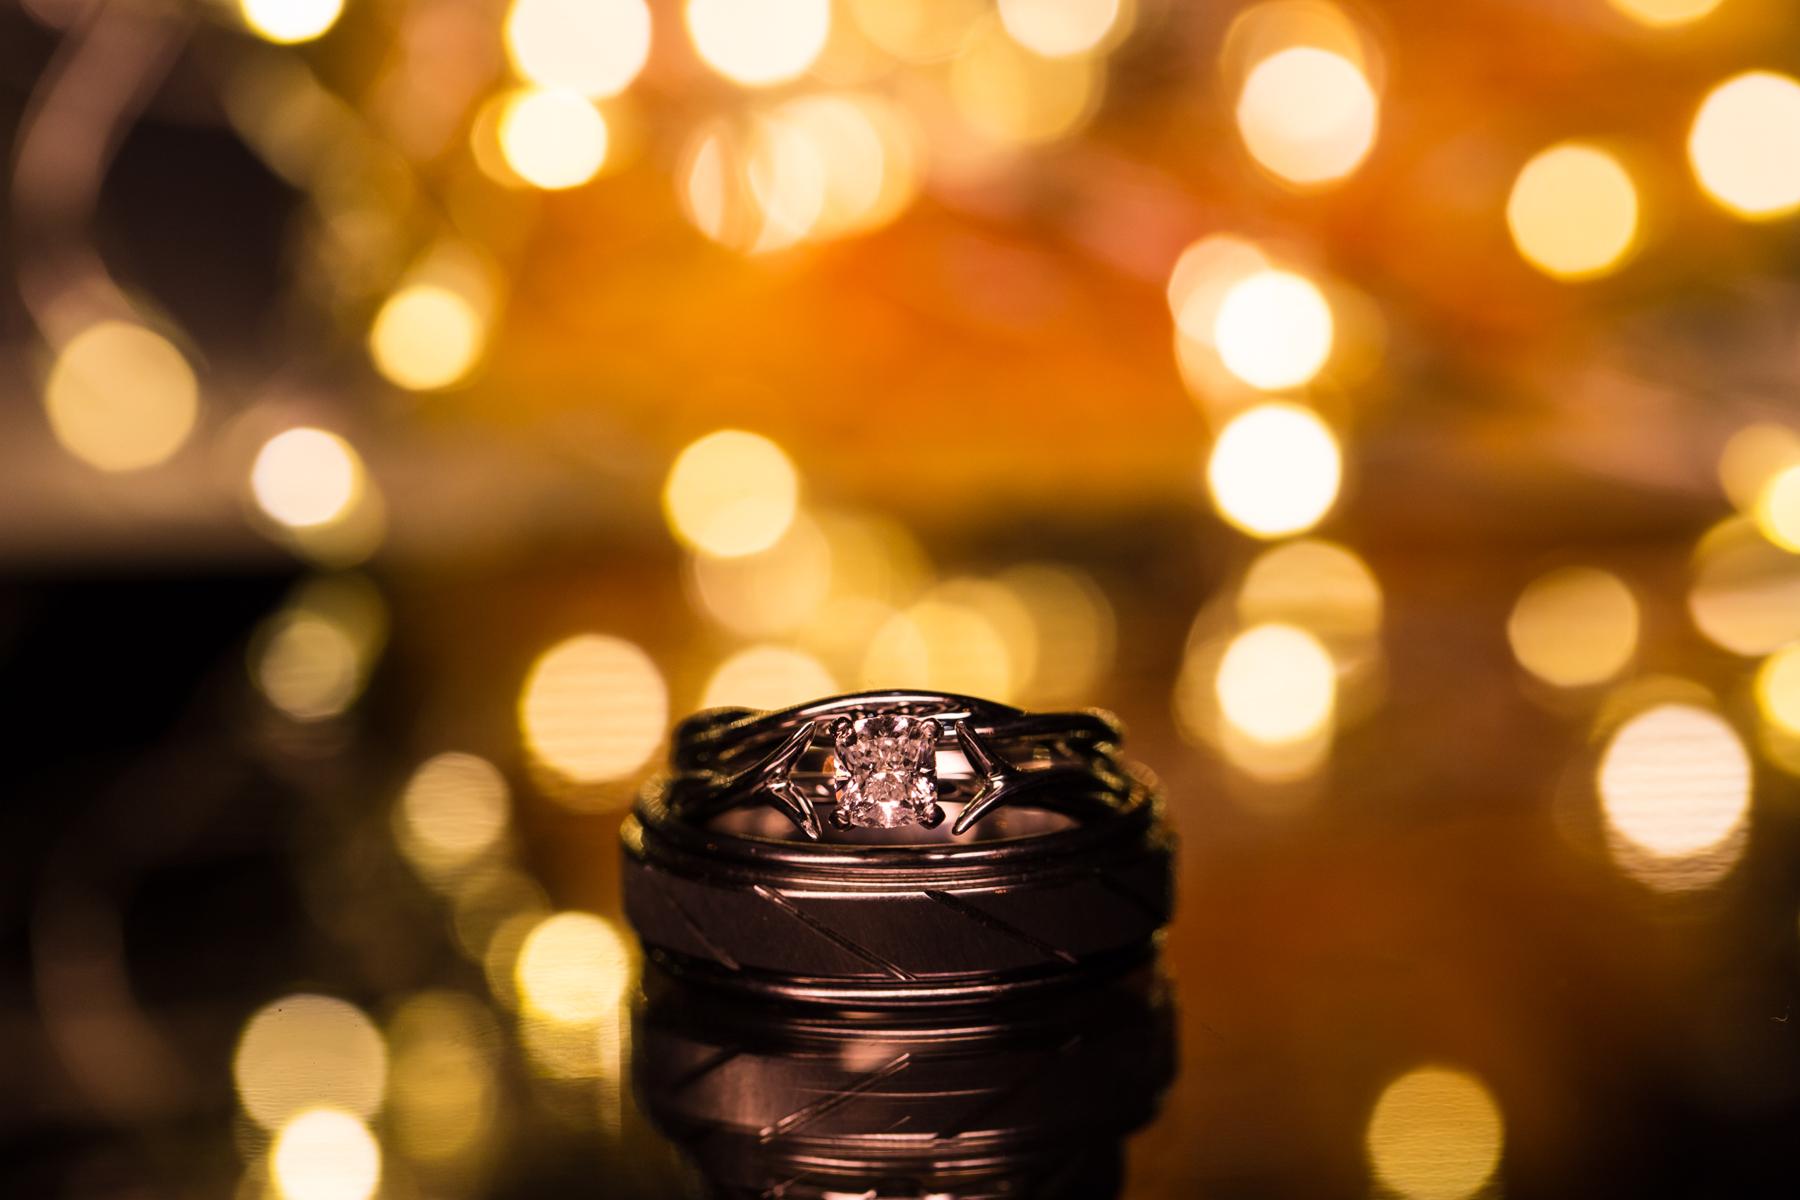 Wedding-ring-photo-nashville-wedding-photo.jpg